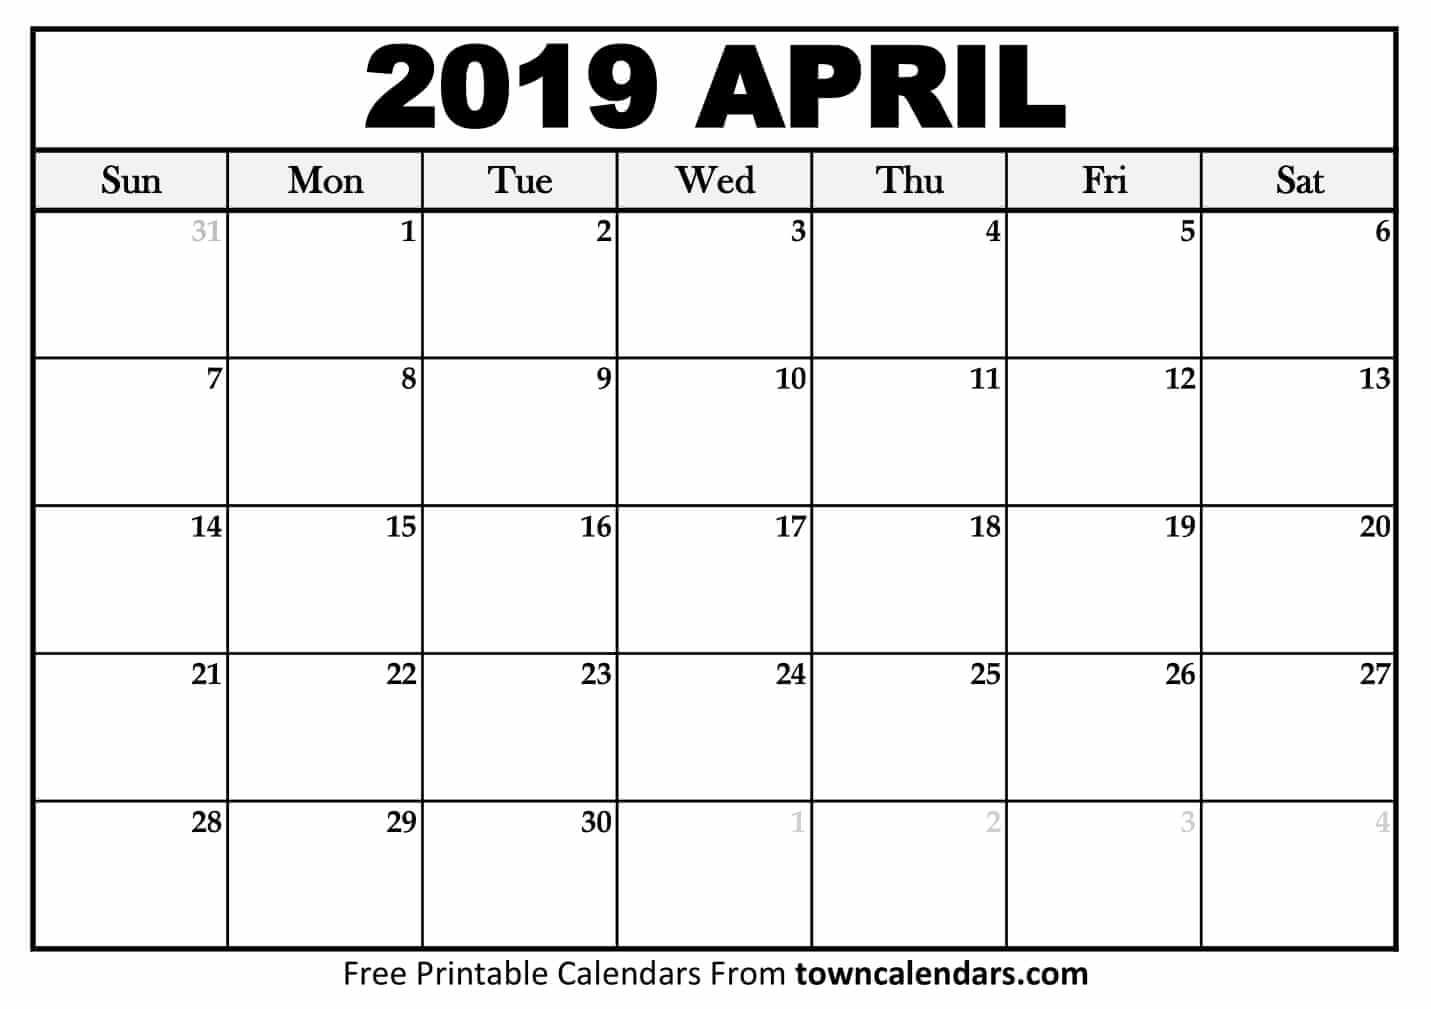 April 2019 Calendar Printable Printable April 2019 Calendar towncalendars